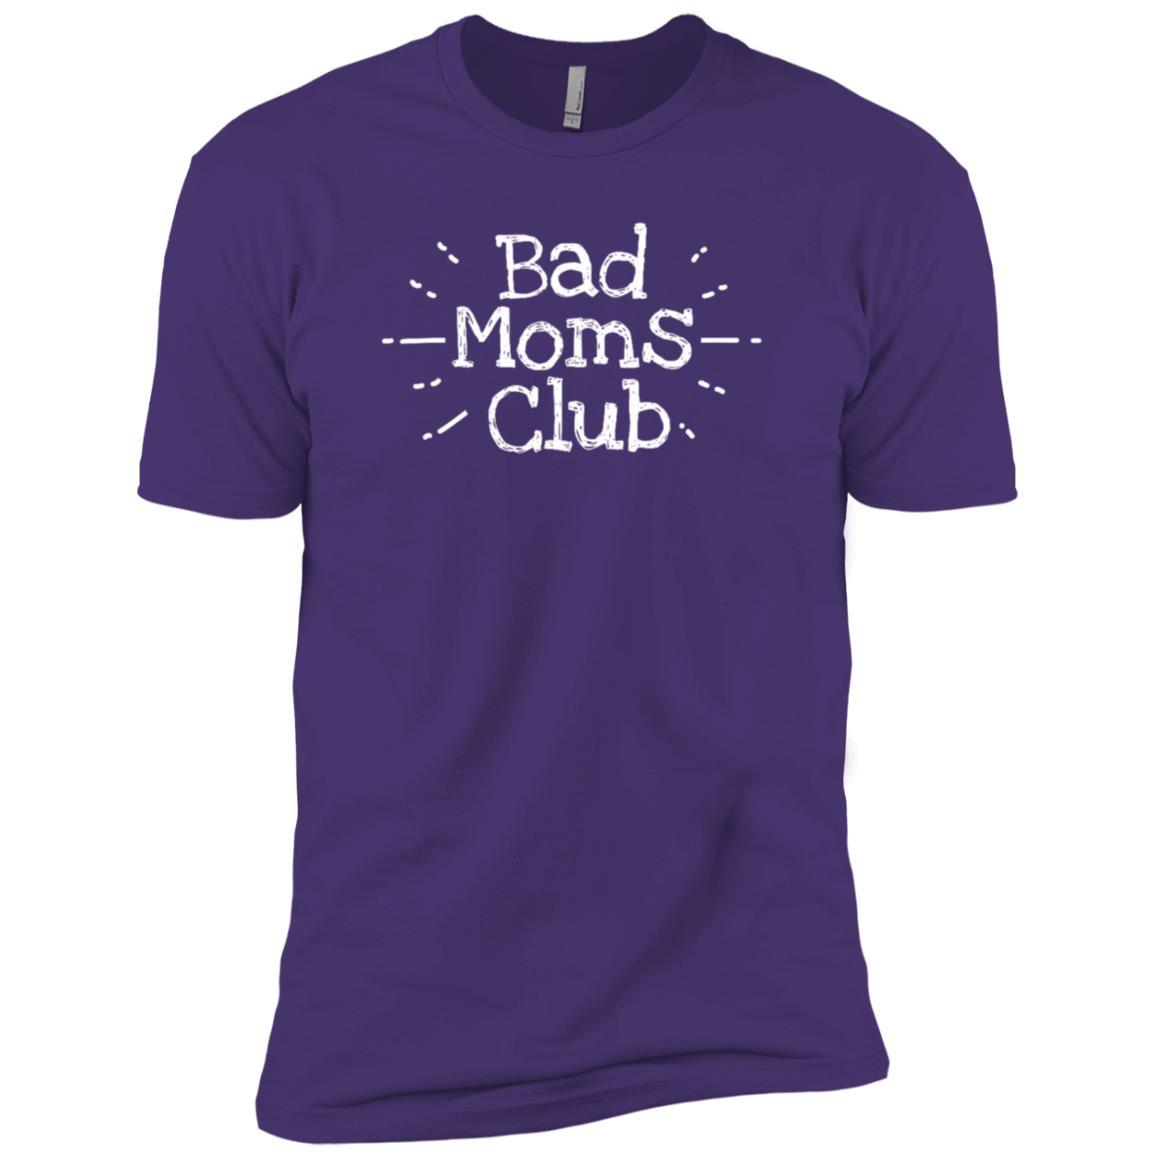 Bad Moms Club Funny Mothers Gift Men Short Sleeve T-Shirt